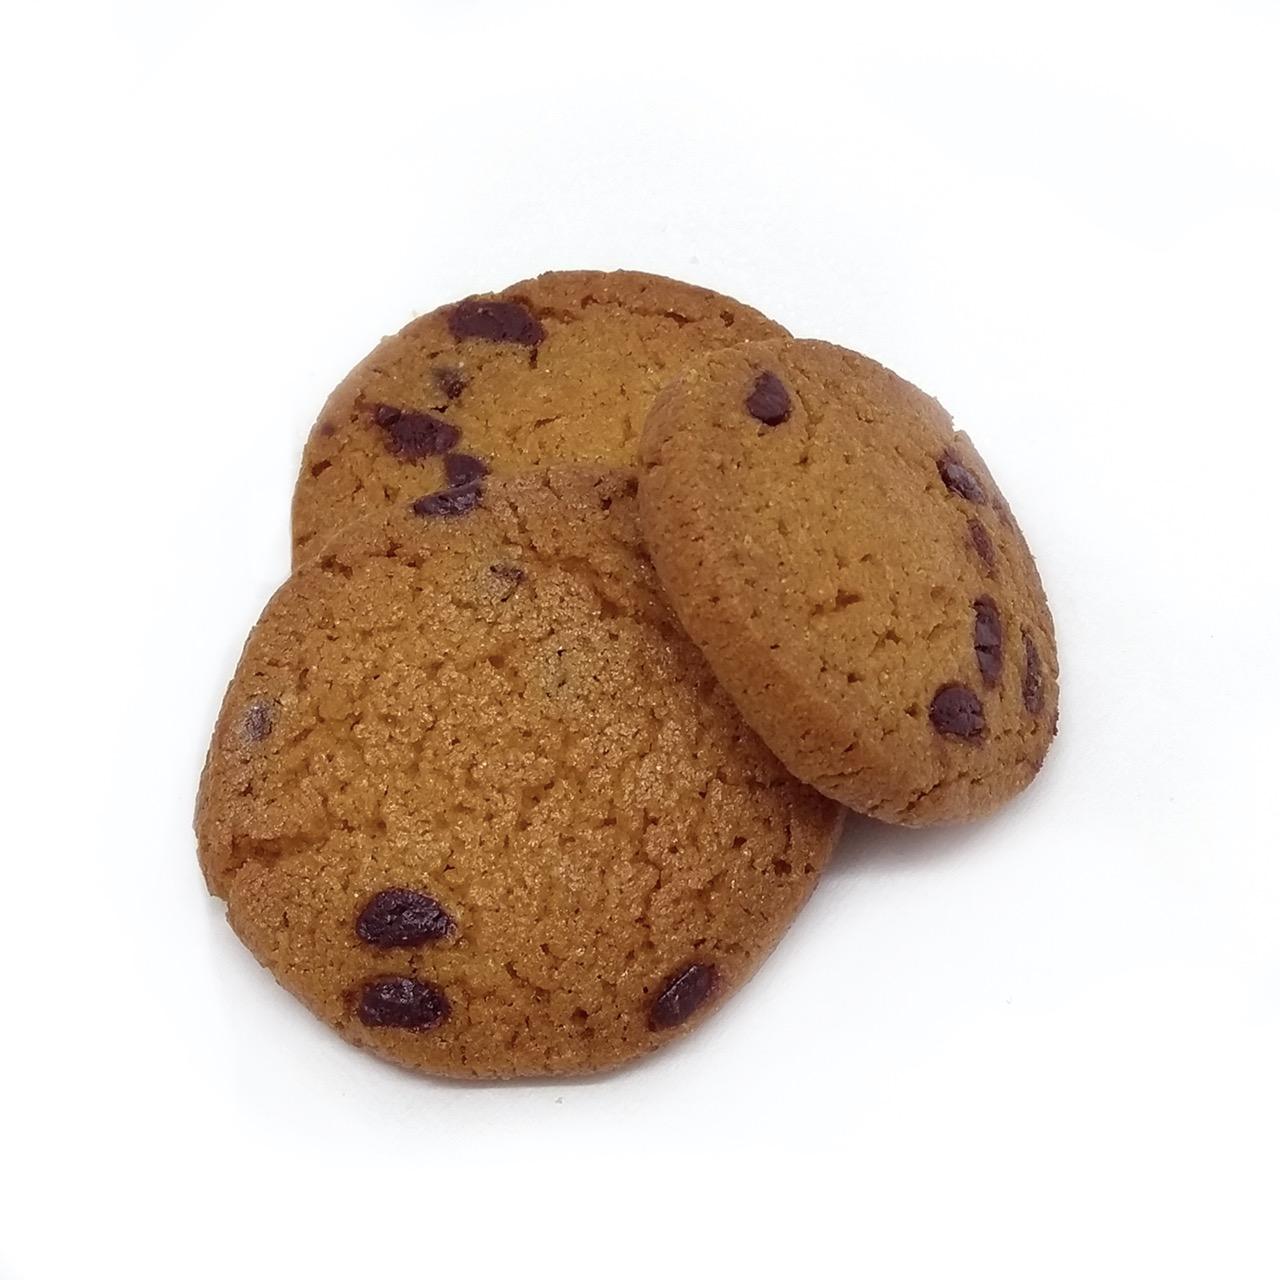 biscotti artigianali, biscotti artigianali Brescia, biscotti artigianali Bergamo